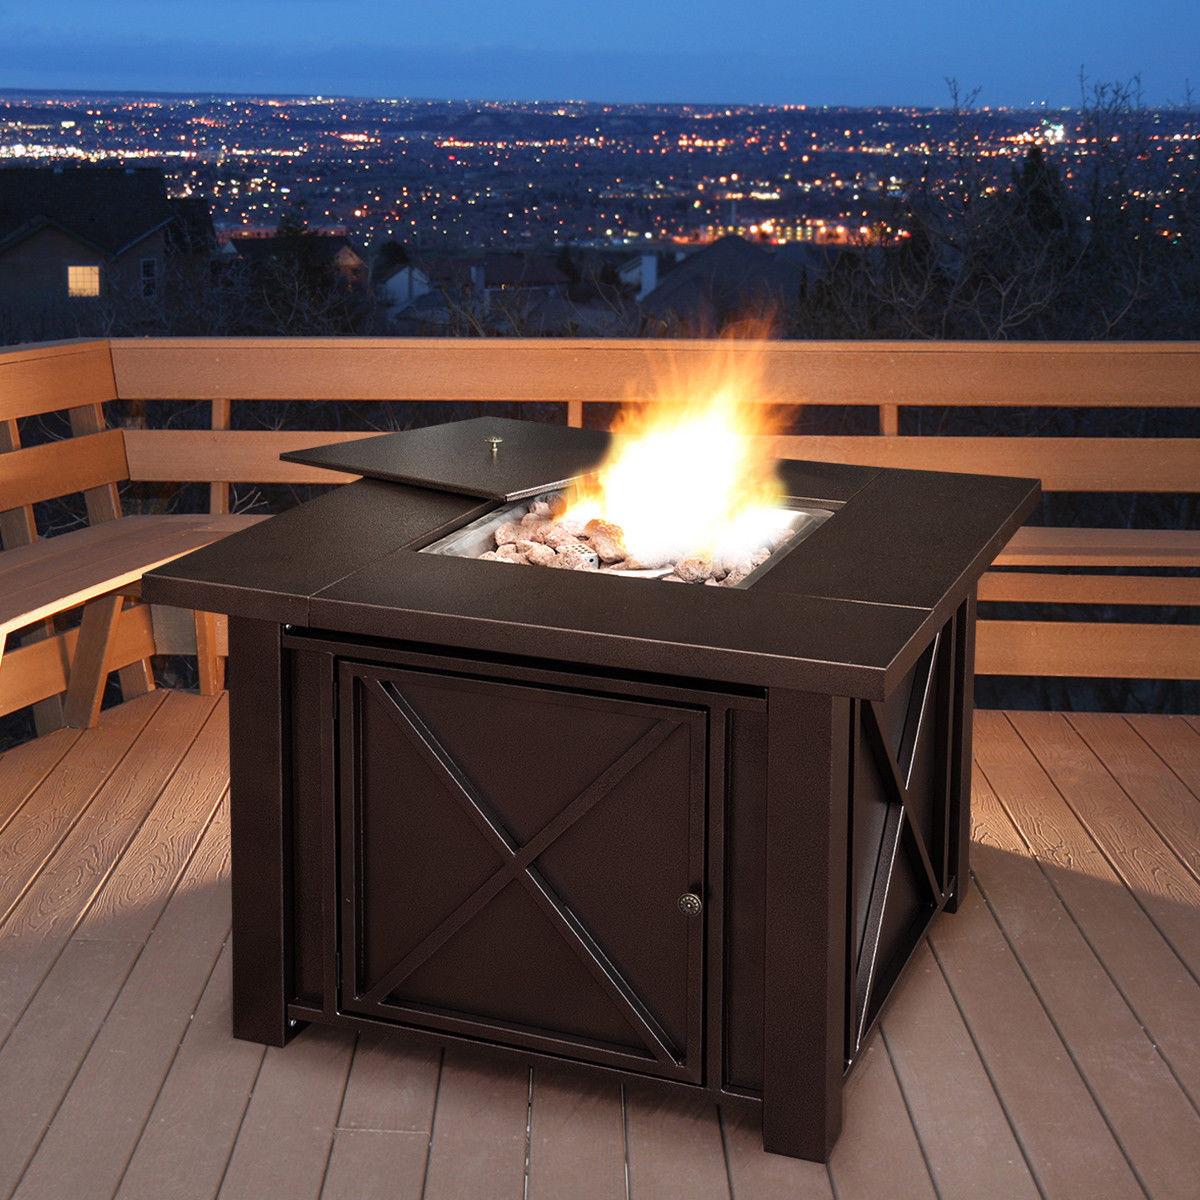 "Costway 38"" Square Patio Heater Propane Gas Fire Pit Table 40000 BTUs Outdoor - image 6 de 10"